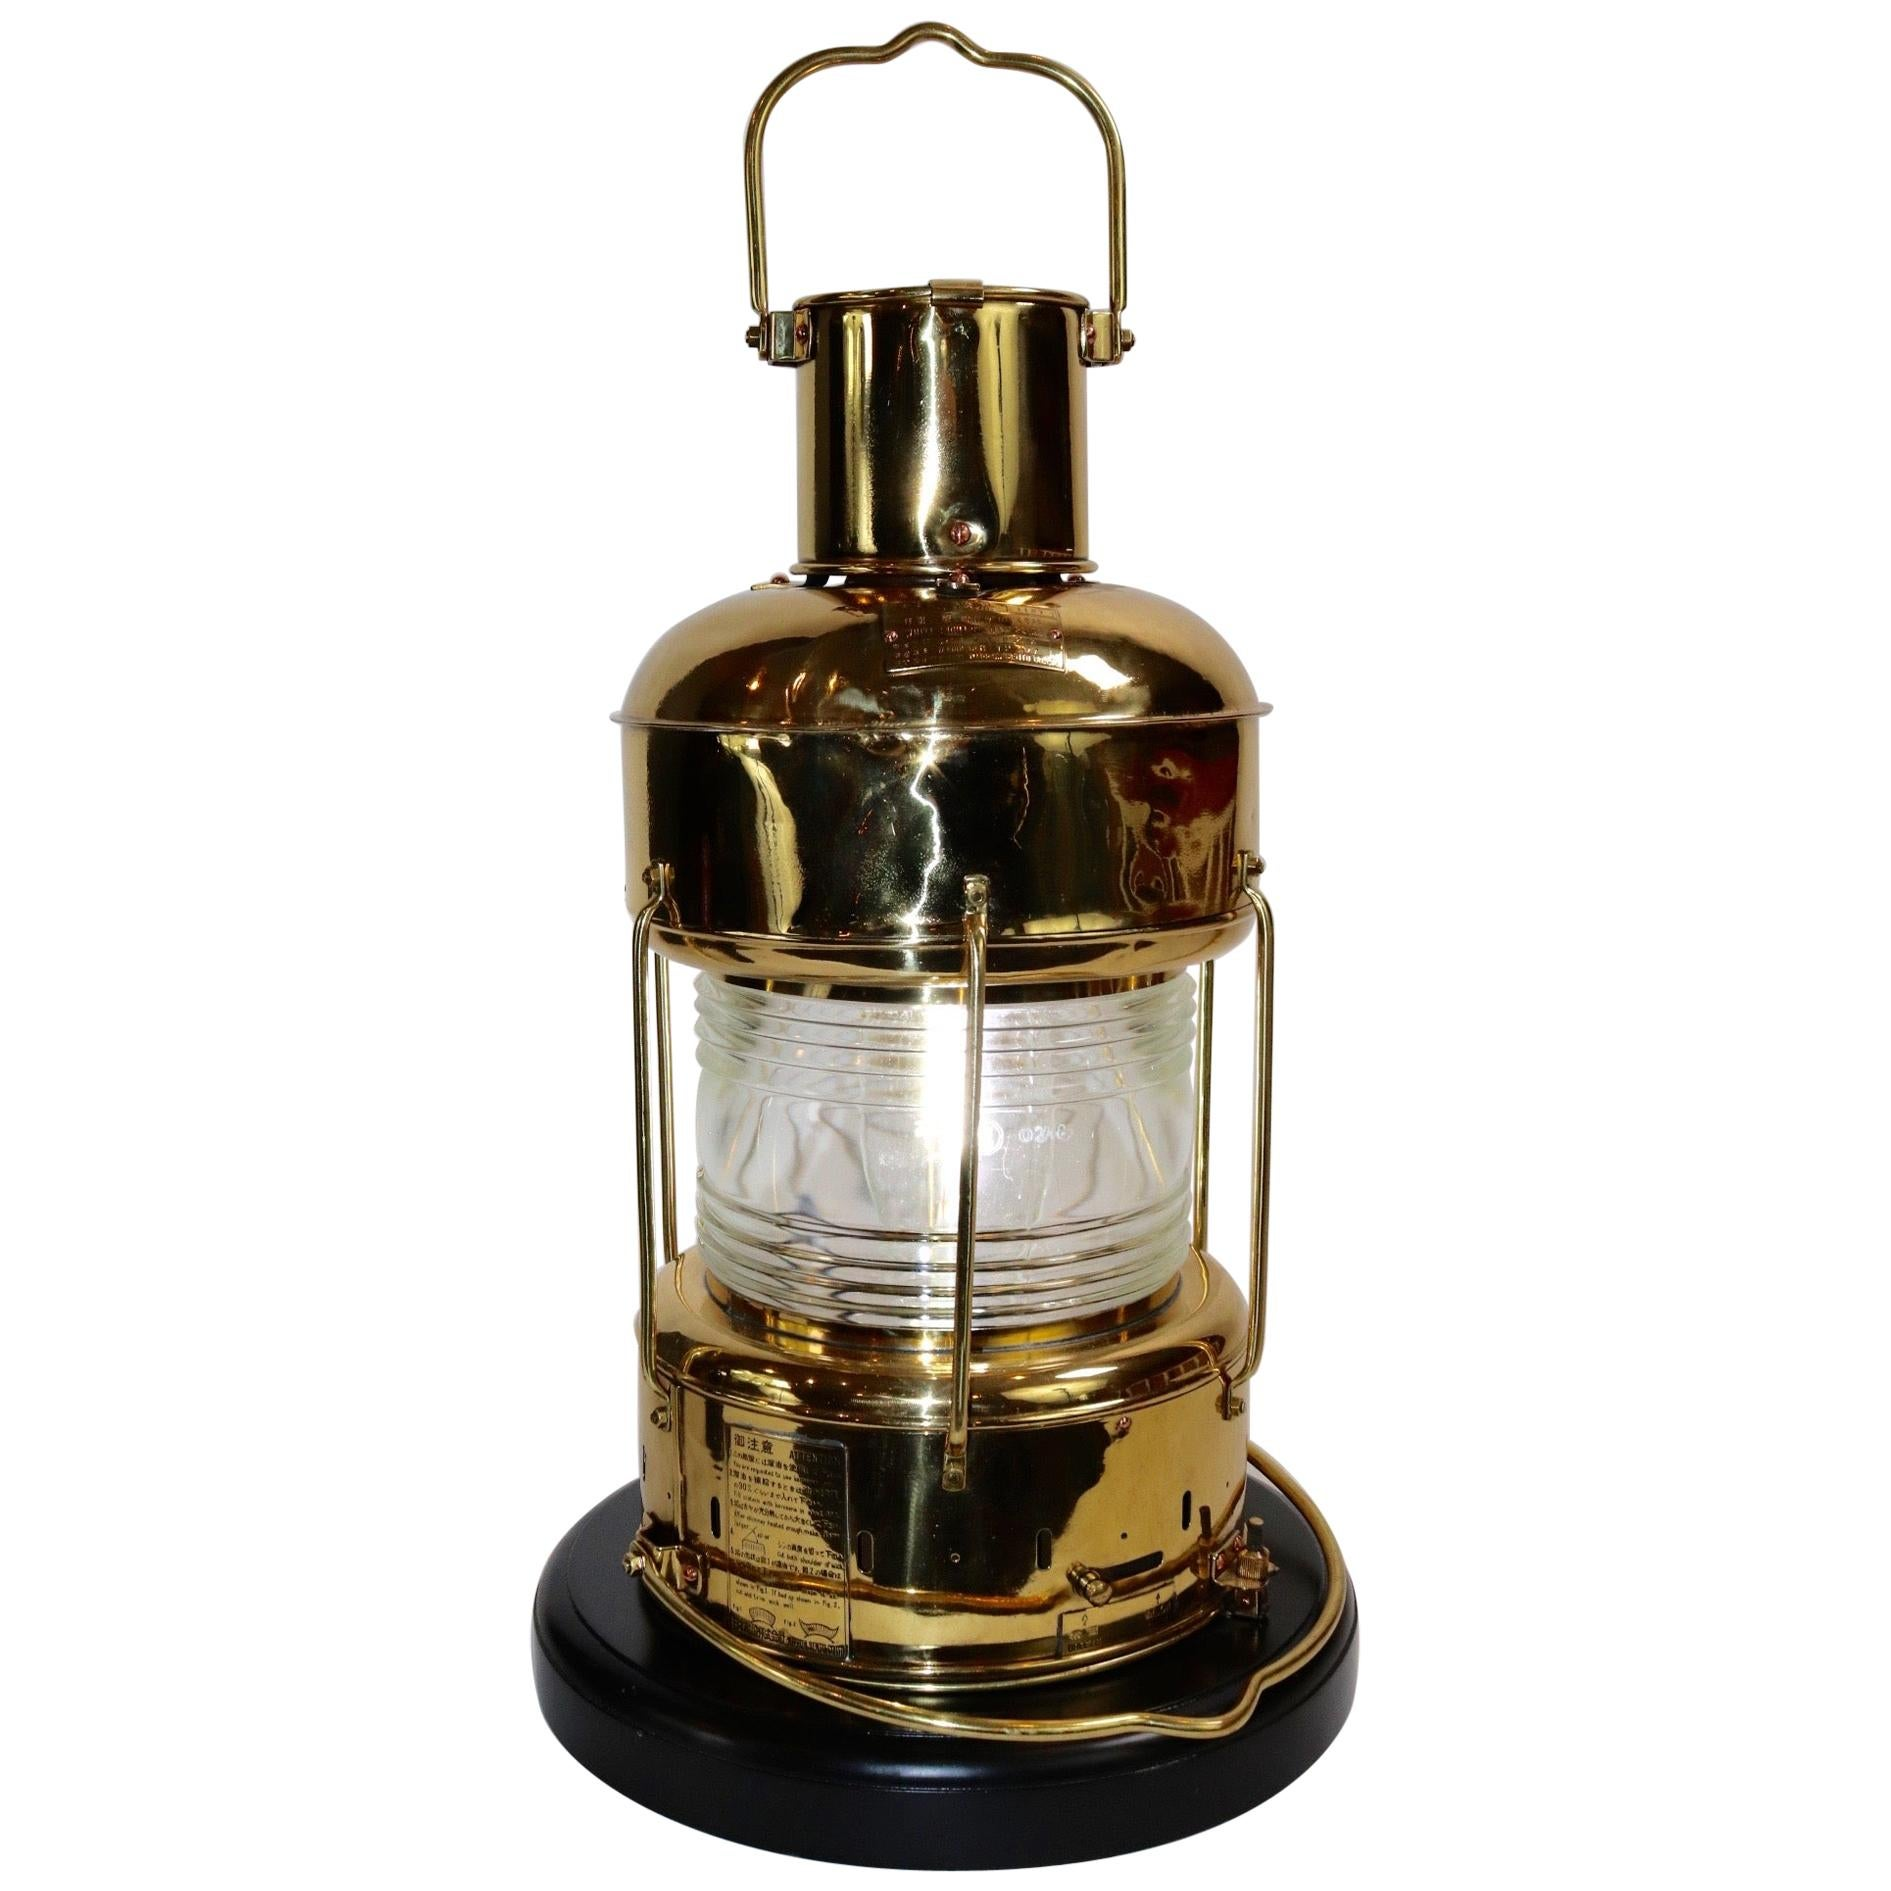 Solid Brass Ships Anchor Lantern